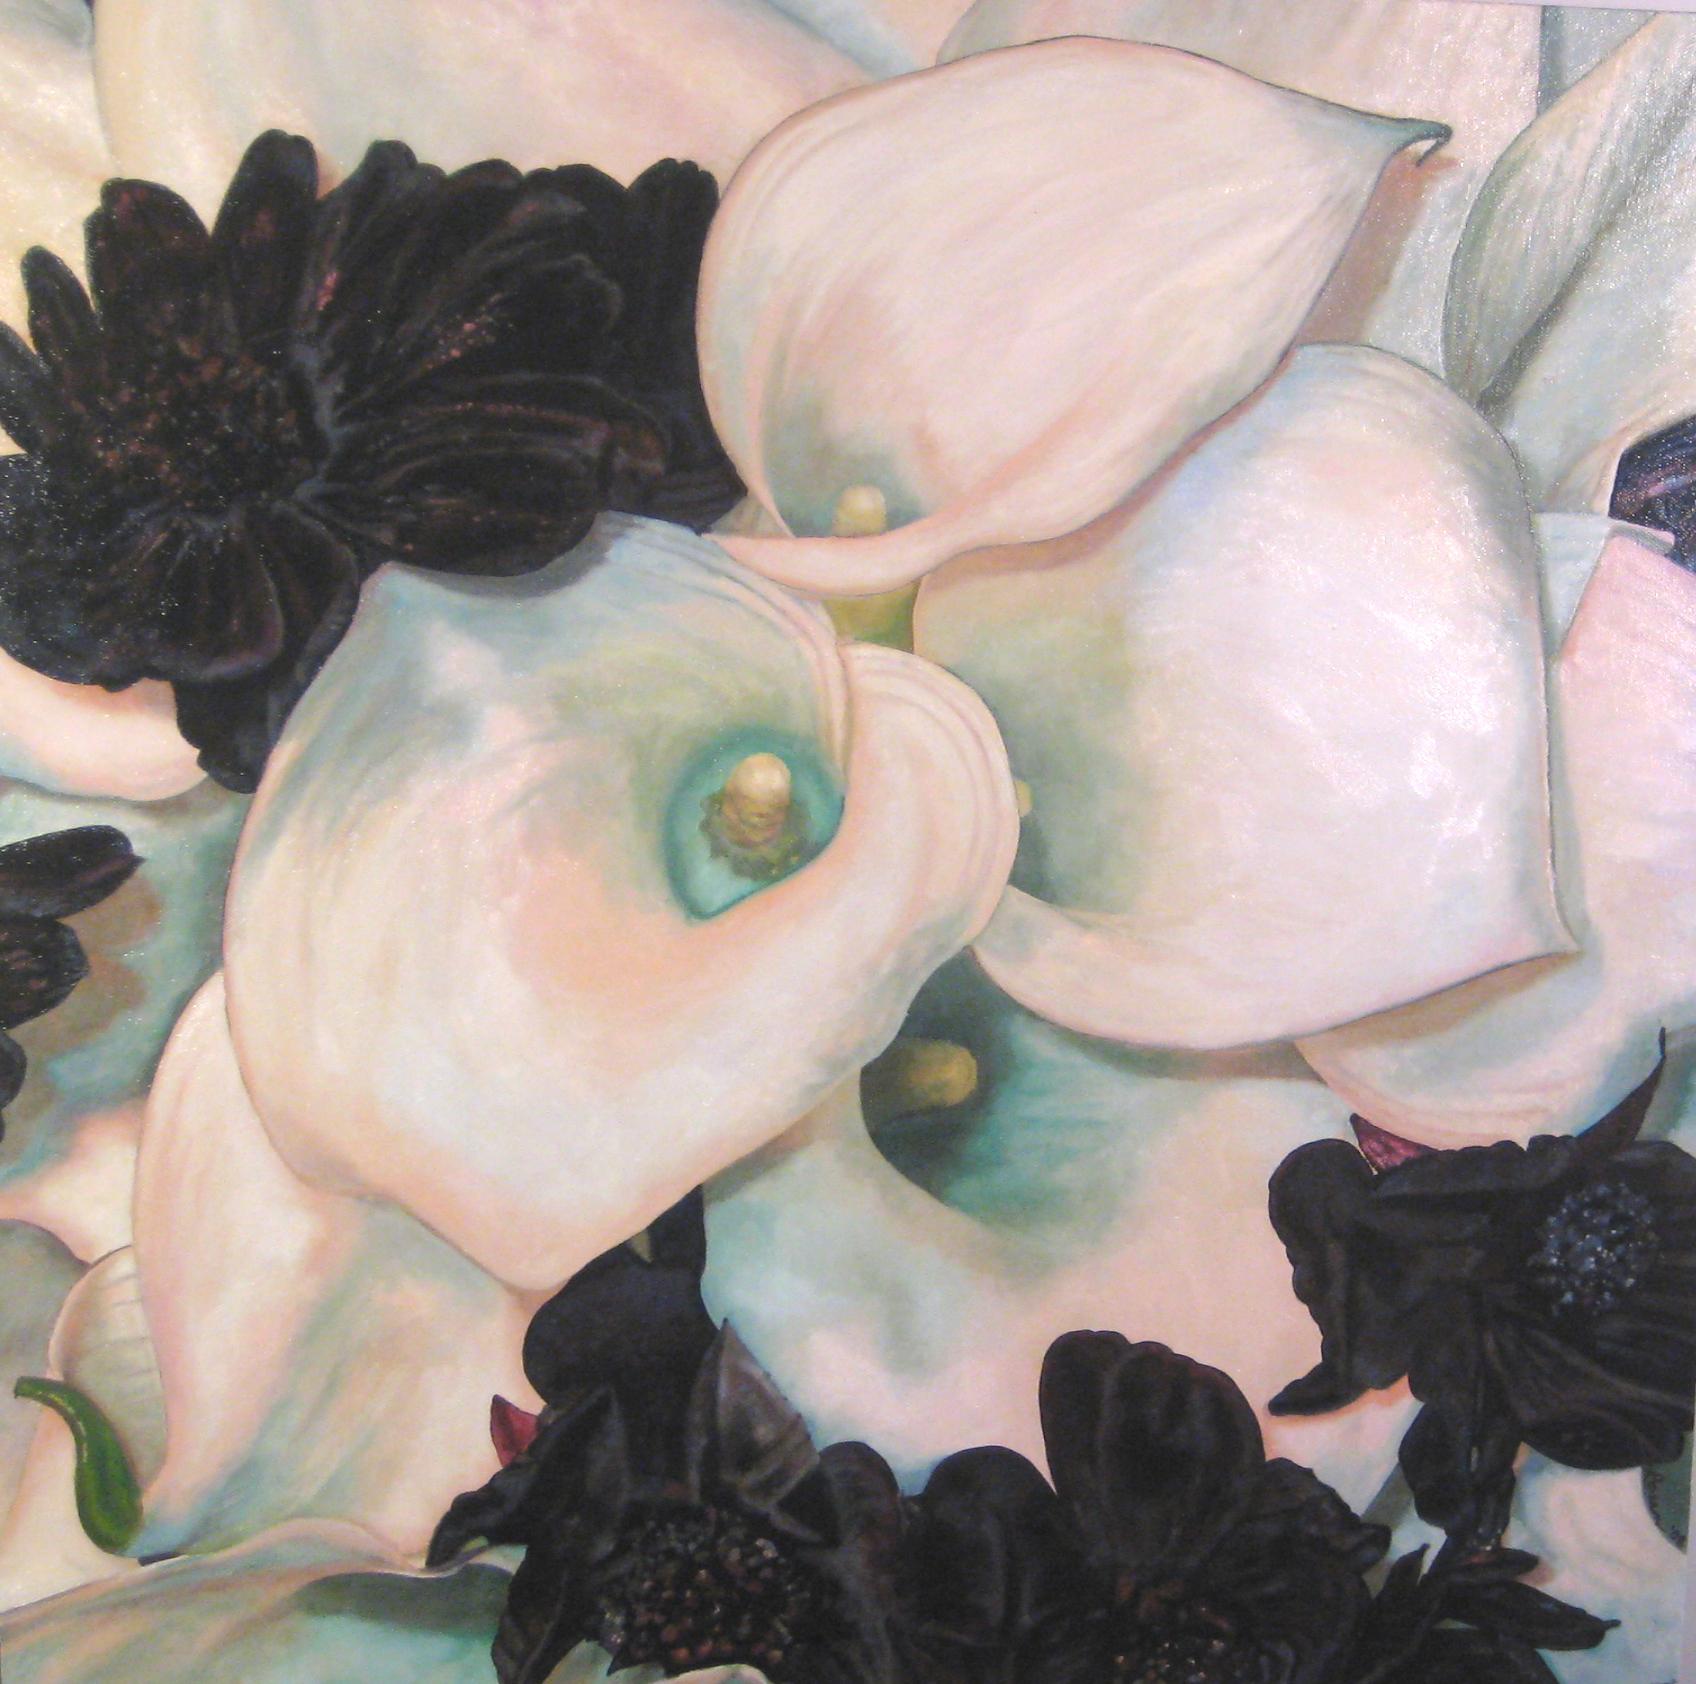 Flowers & Decor, Bride Bouquets, Flowers, Bouquet, Custom, Gift, Rose, Photo, Preservation, Painting, Memorabilia, Reenie rose, Reenie